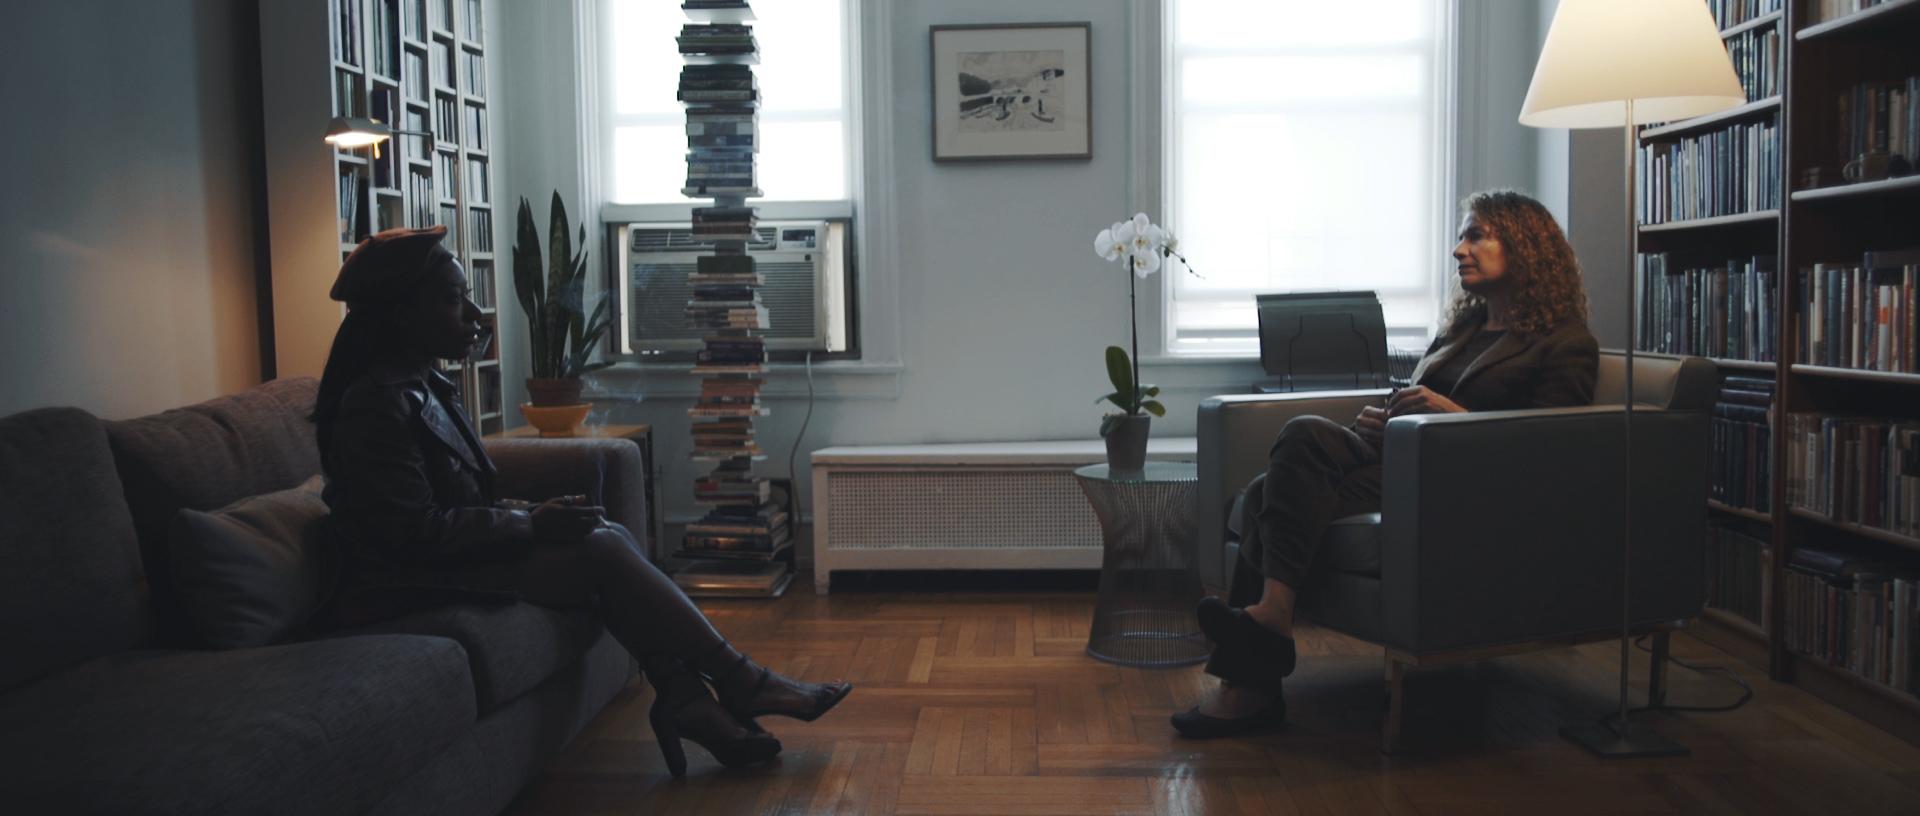 Director | Praise Odigie  Cinematographers | Tim Ciavara + Kelsey Smith  Production Designer | Jiin Choi  2015